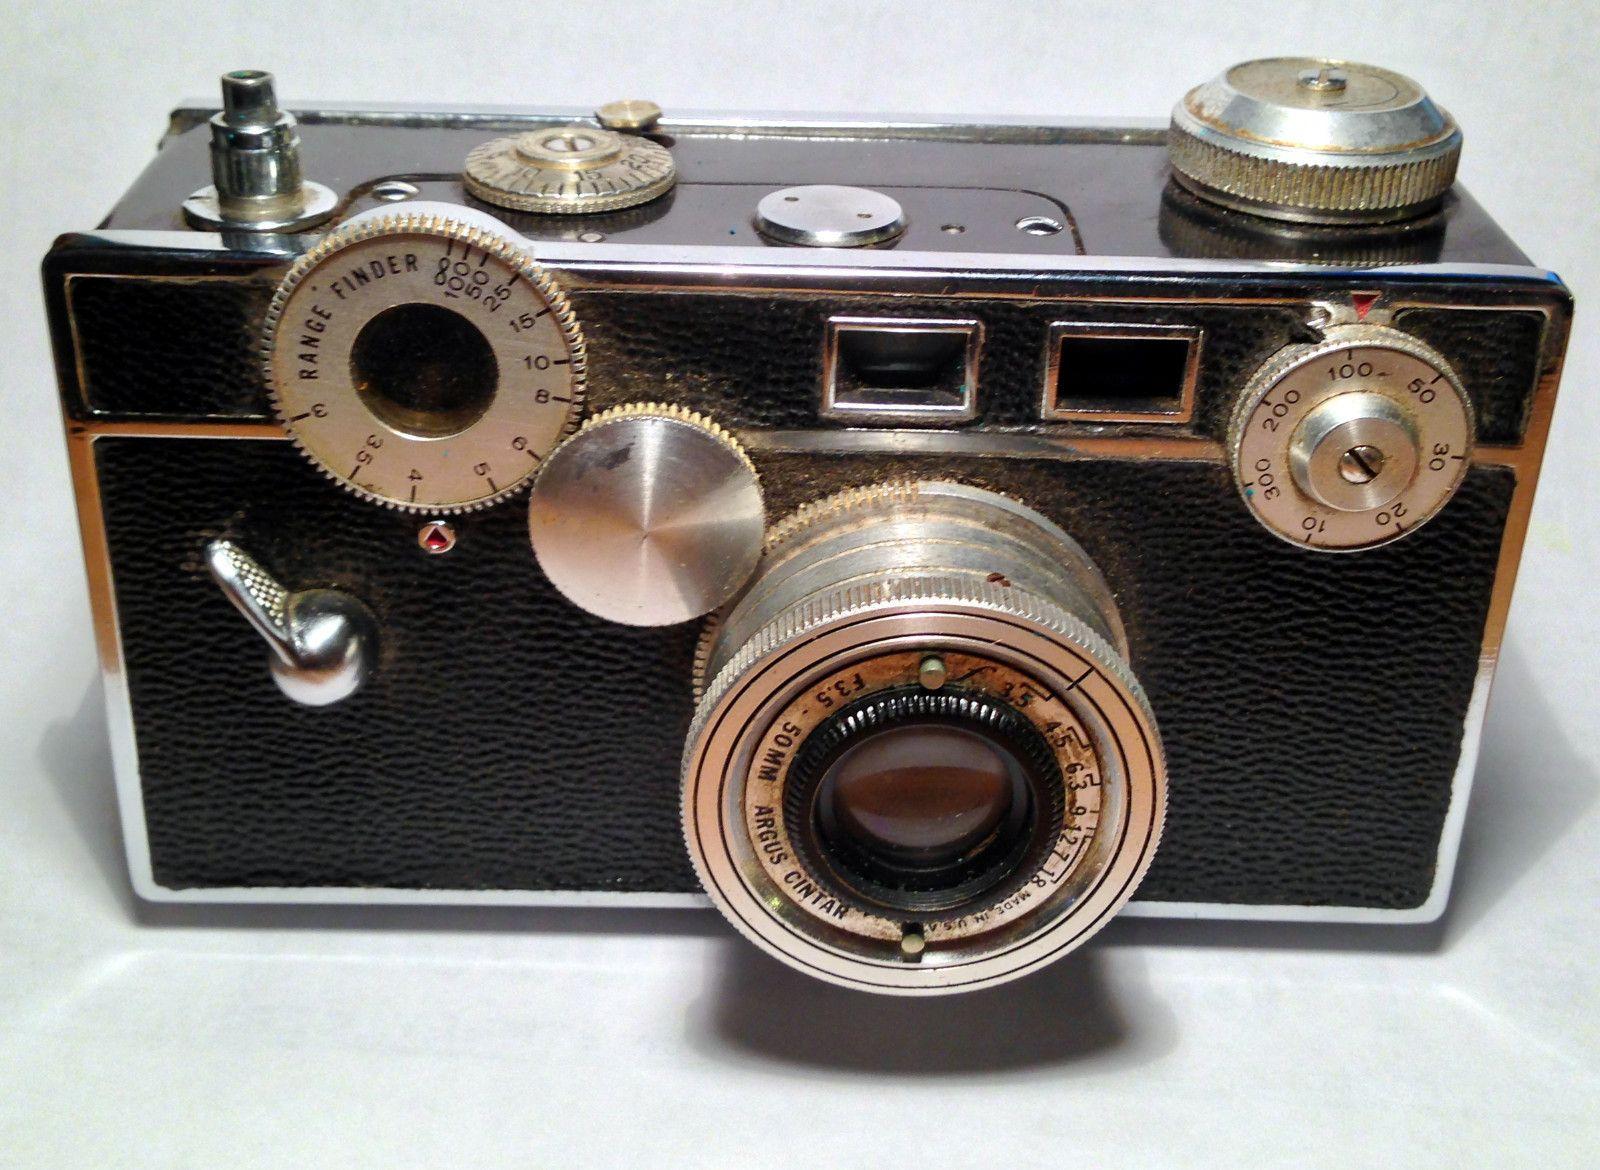 Vintage Argus C3 35 mm Camera